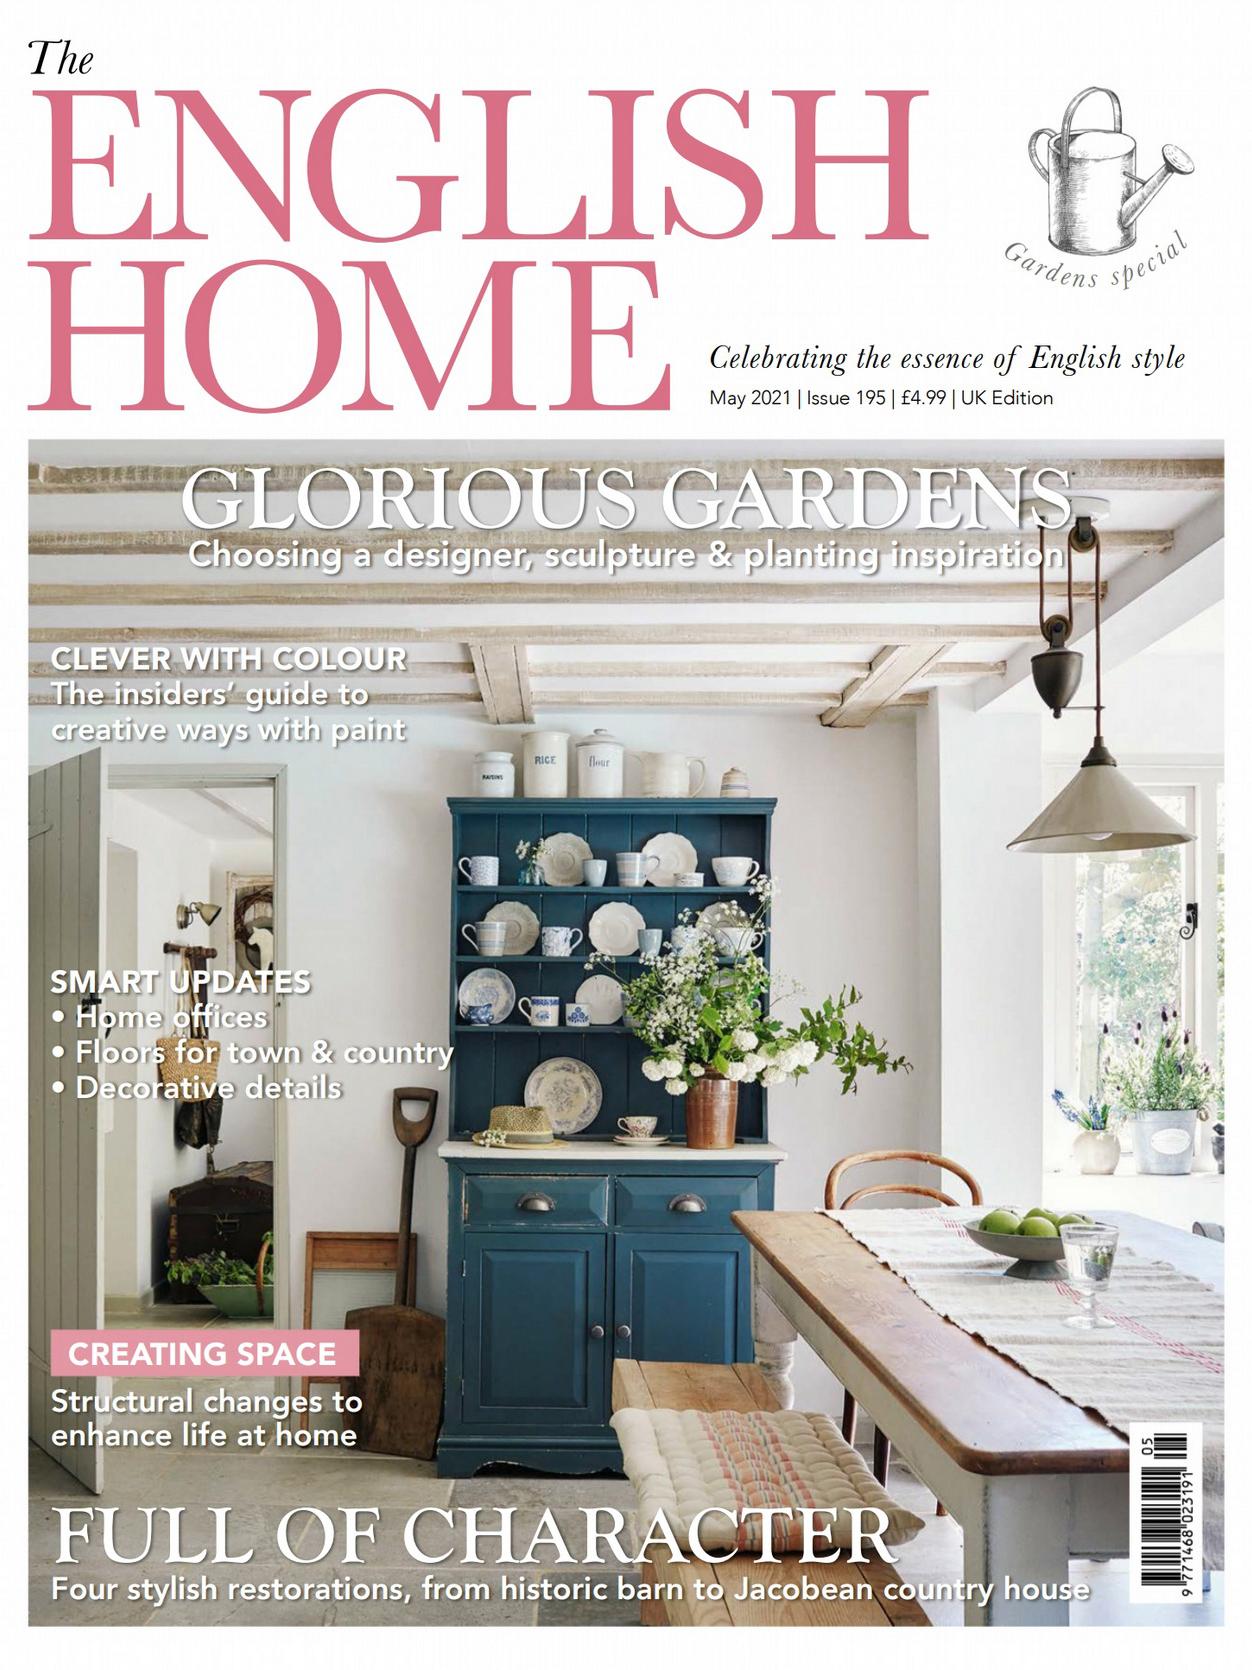 《The English Home》英国版时尚家居杂志2021年05月号